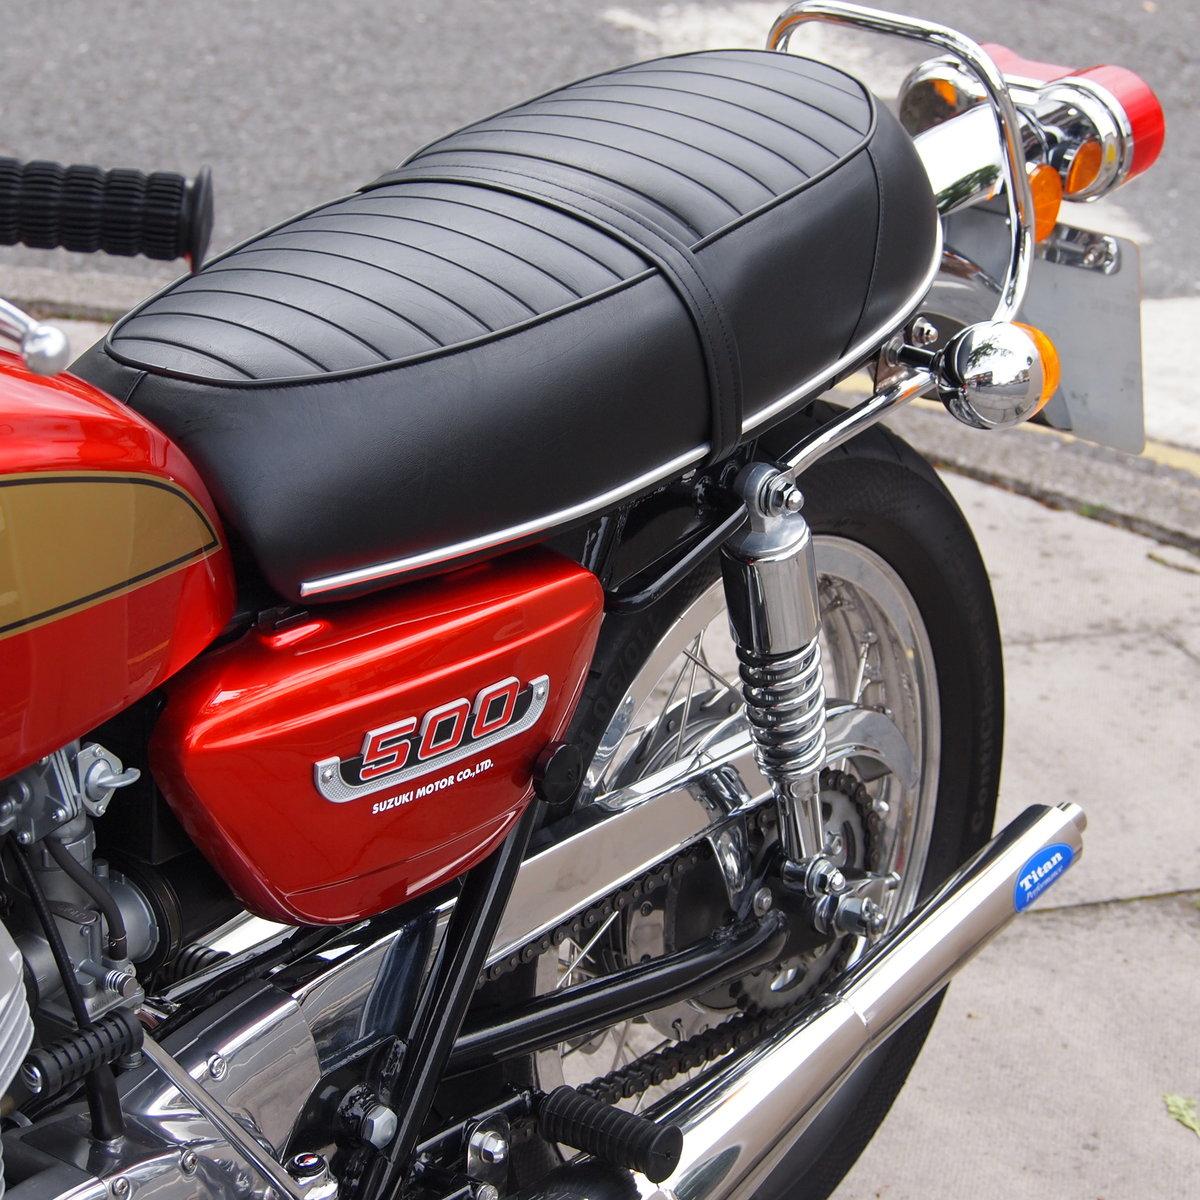 1974 Suzuki T500 In Beautiful Condition SOLD (picture 4 of 6)